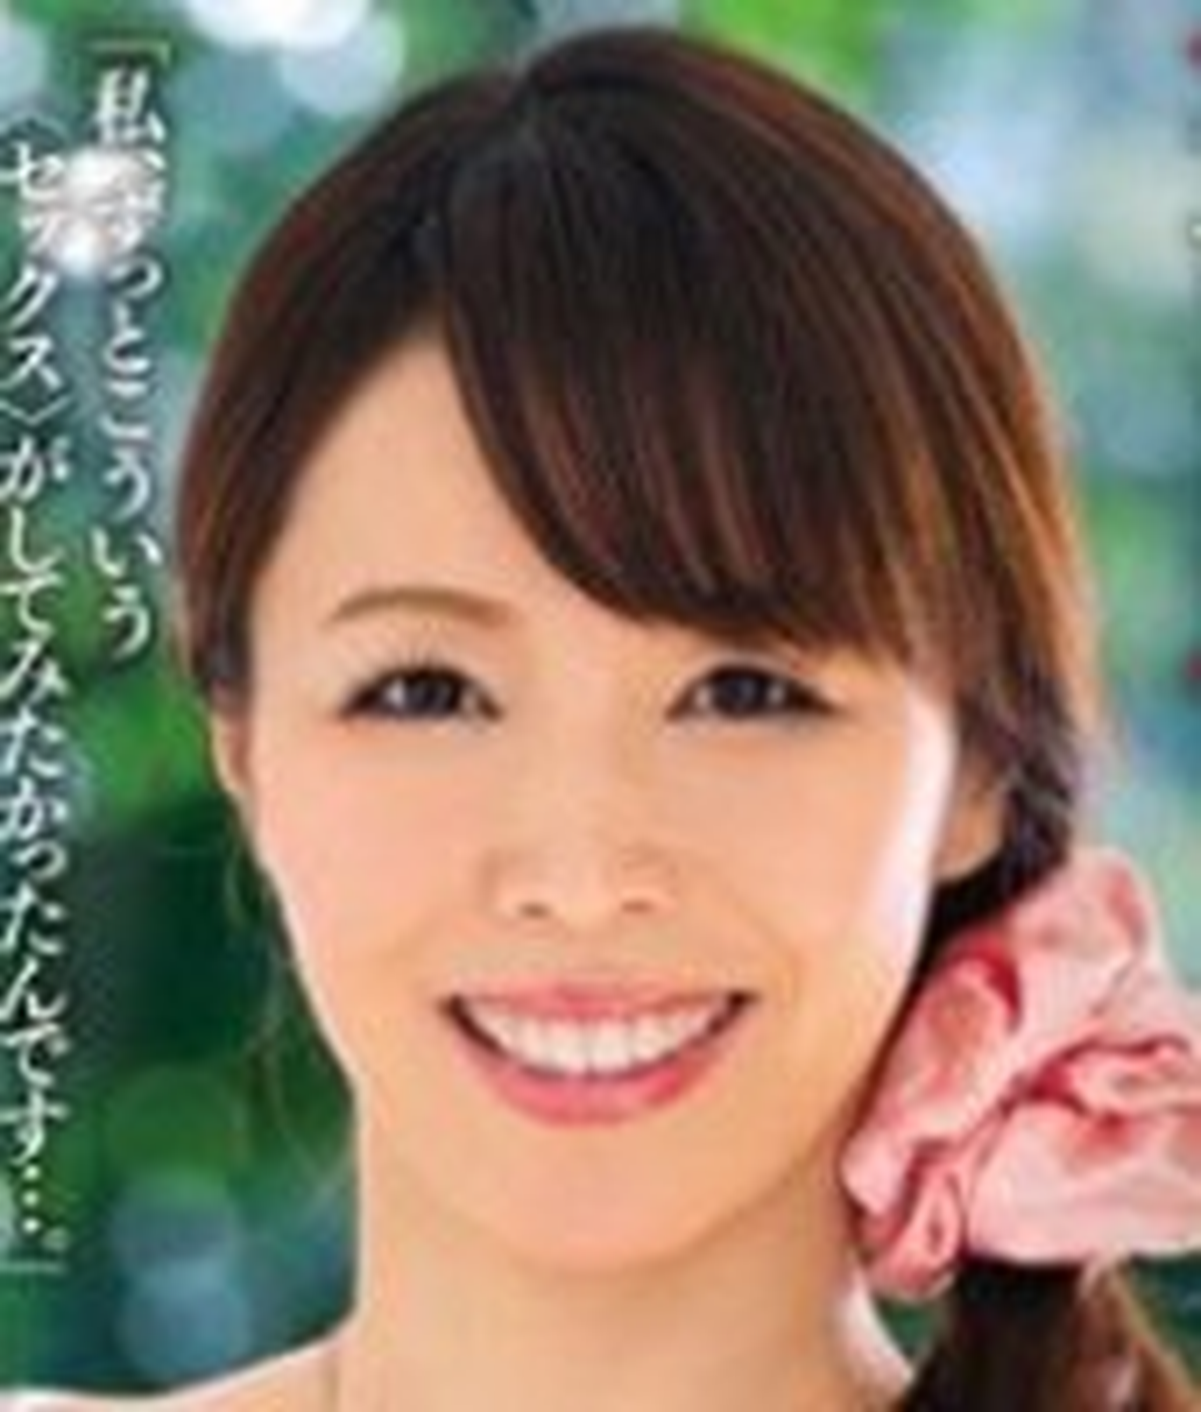 Kyoko Yabuki